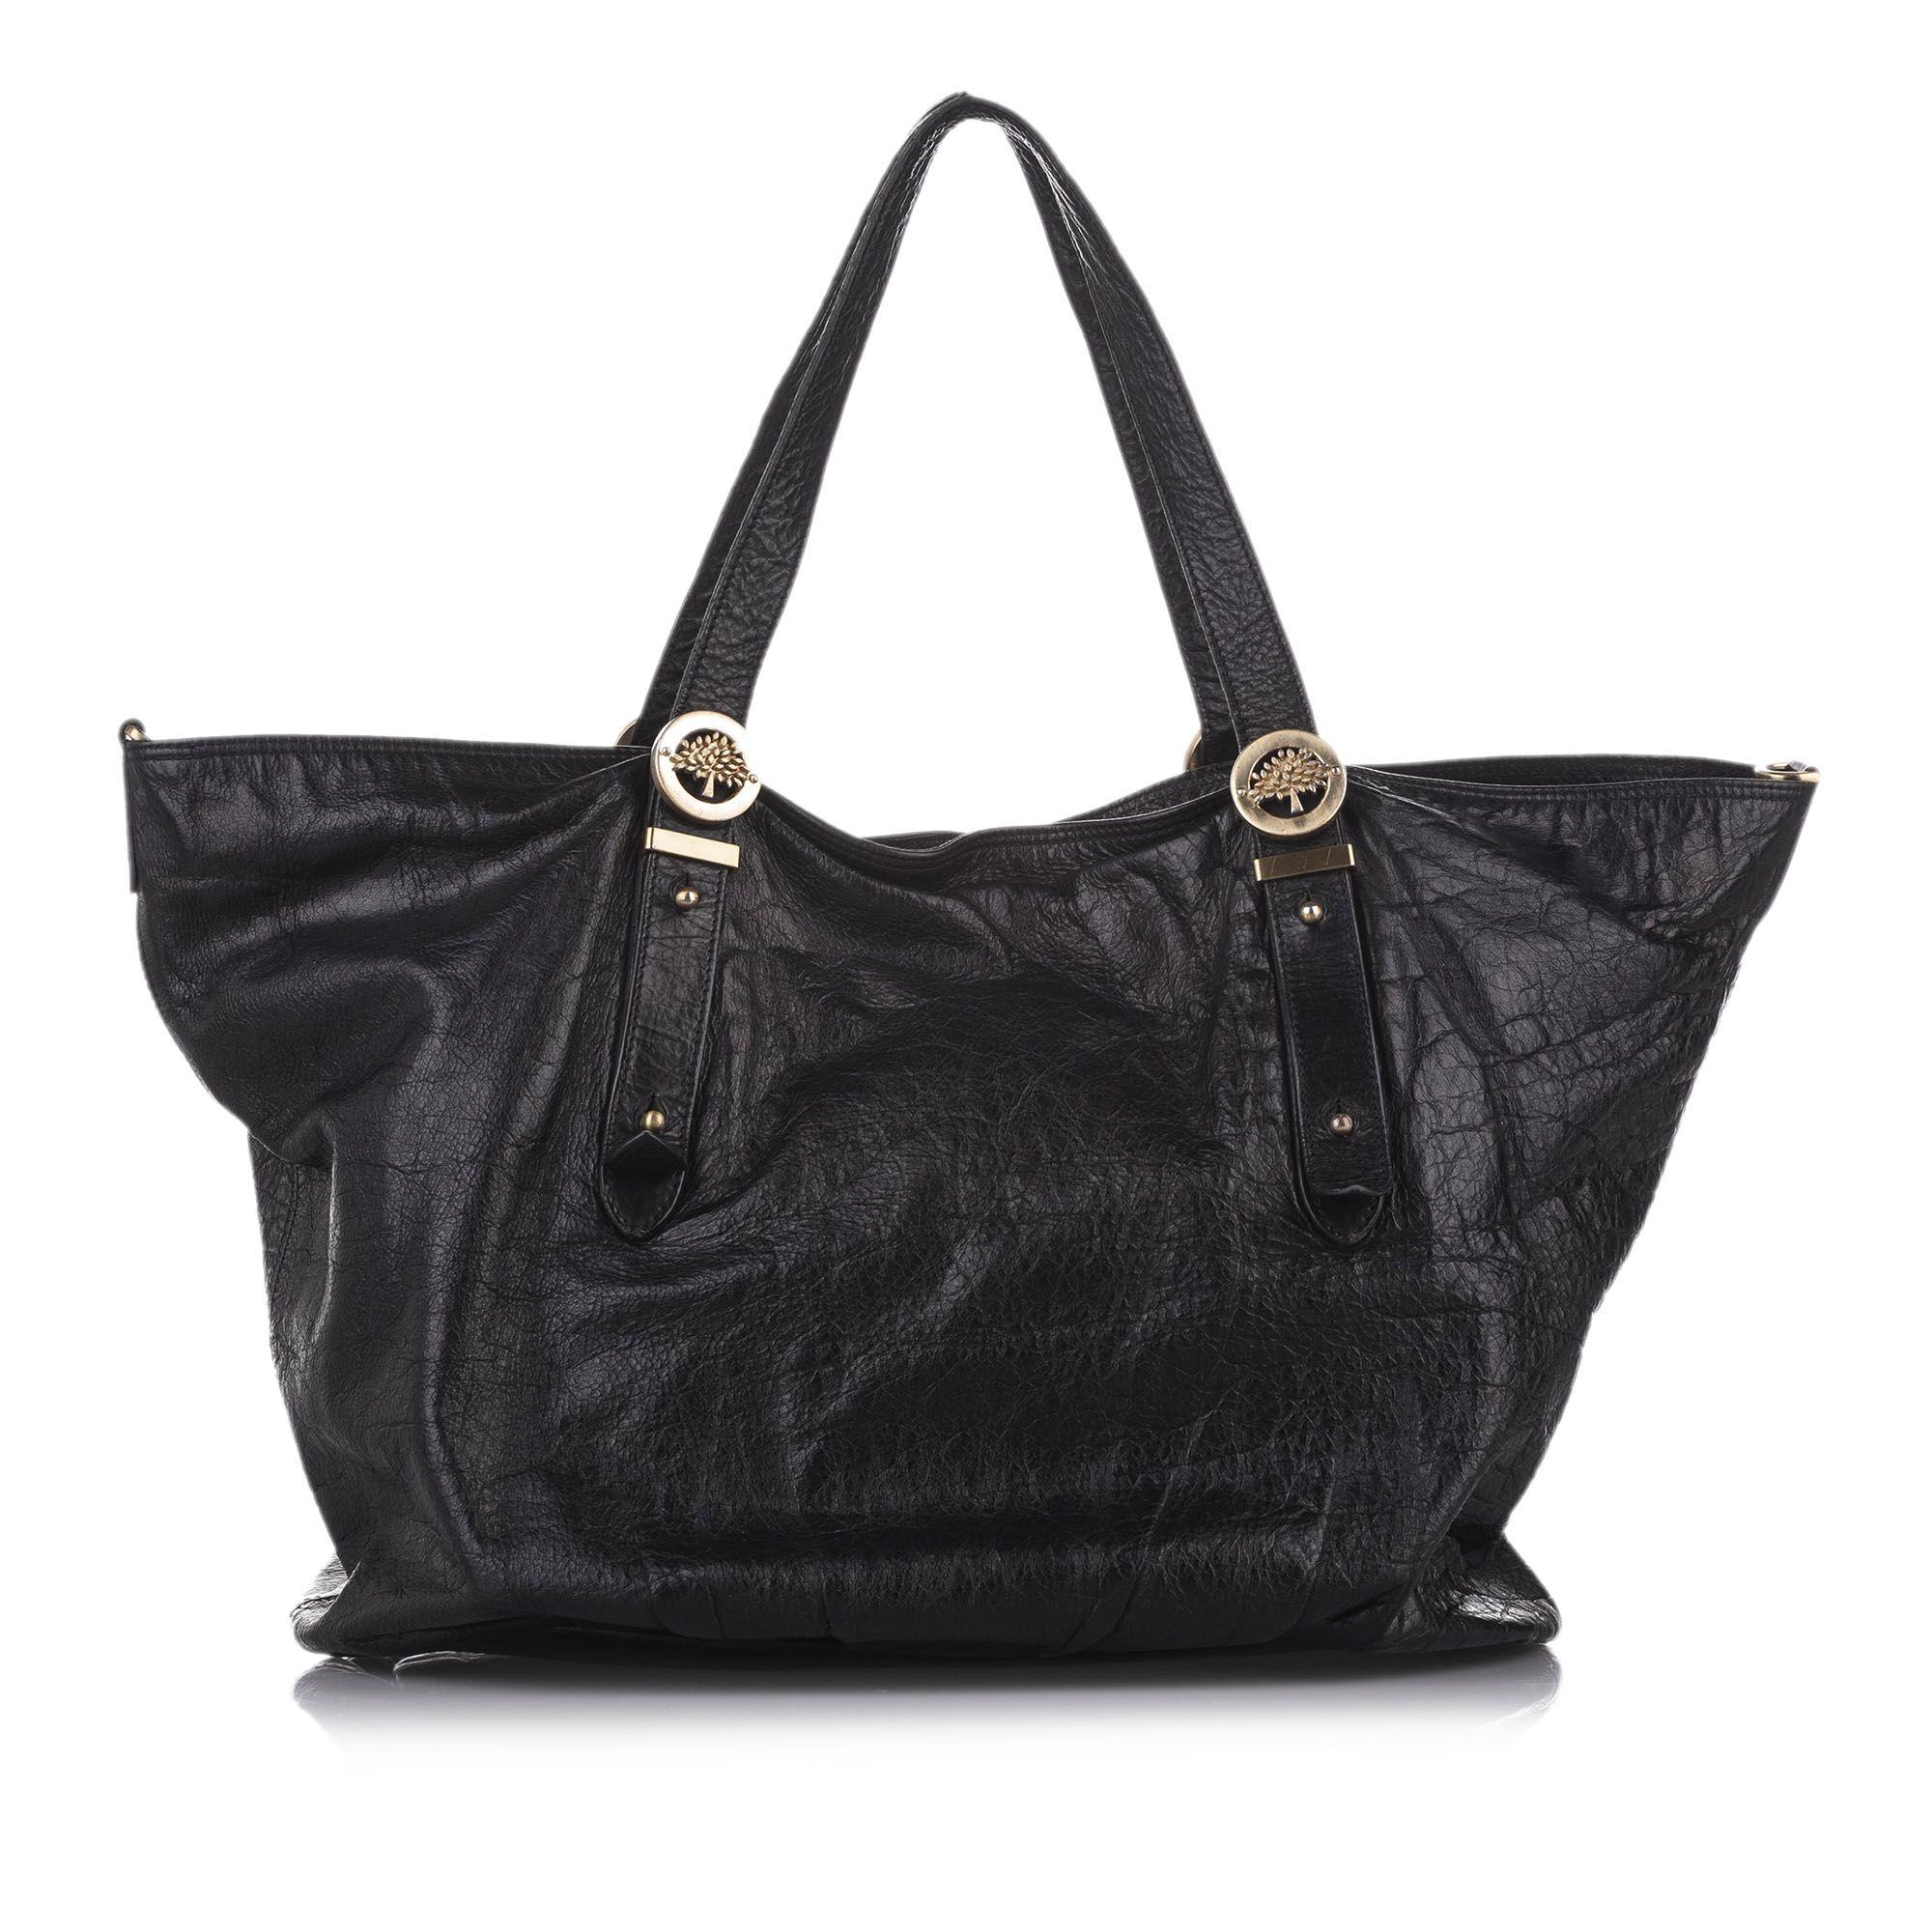 Vintage Mulberry Leather Tote Bag Black